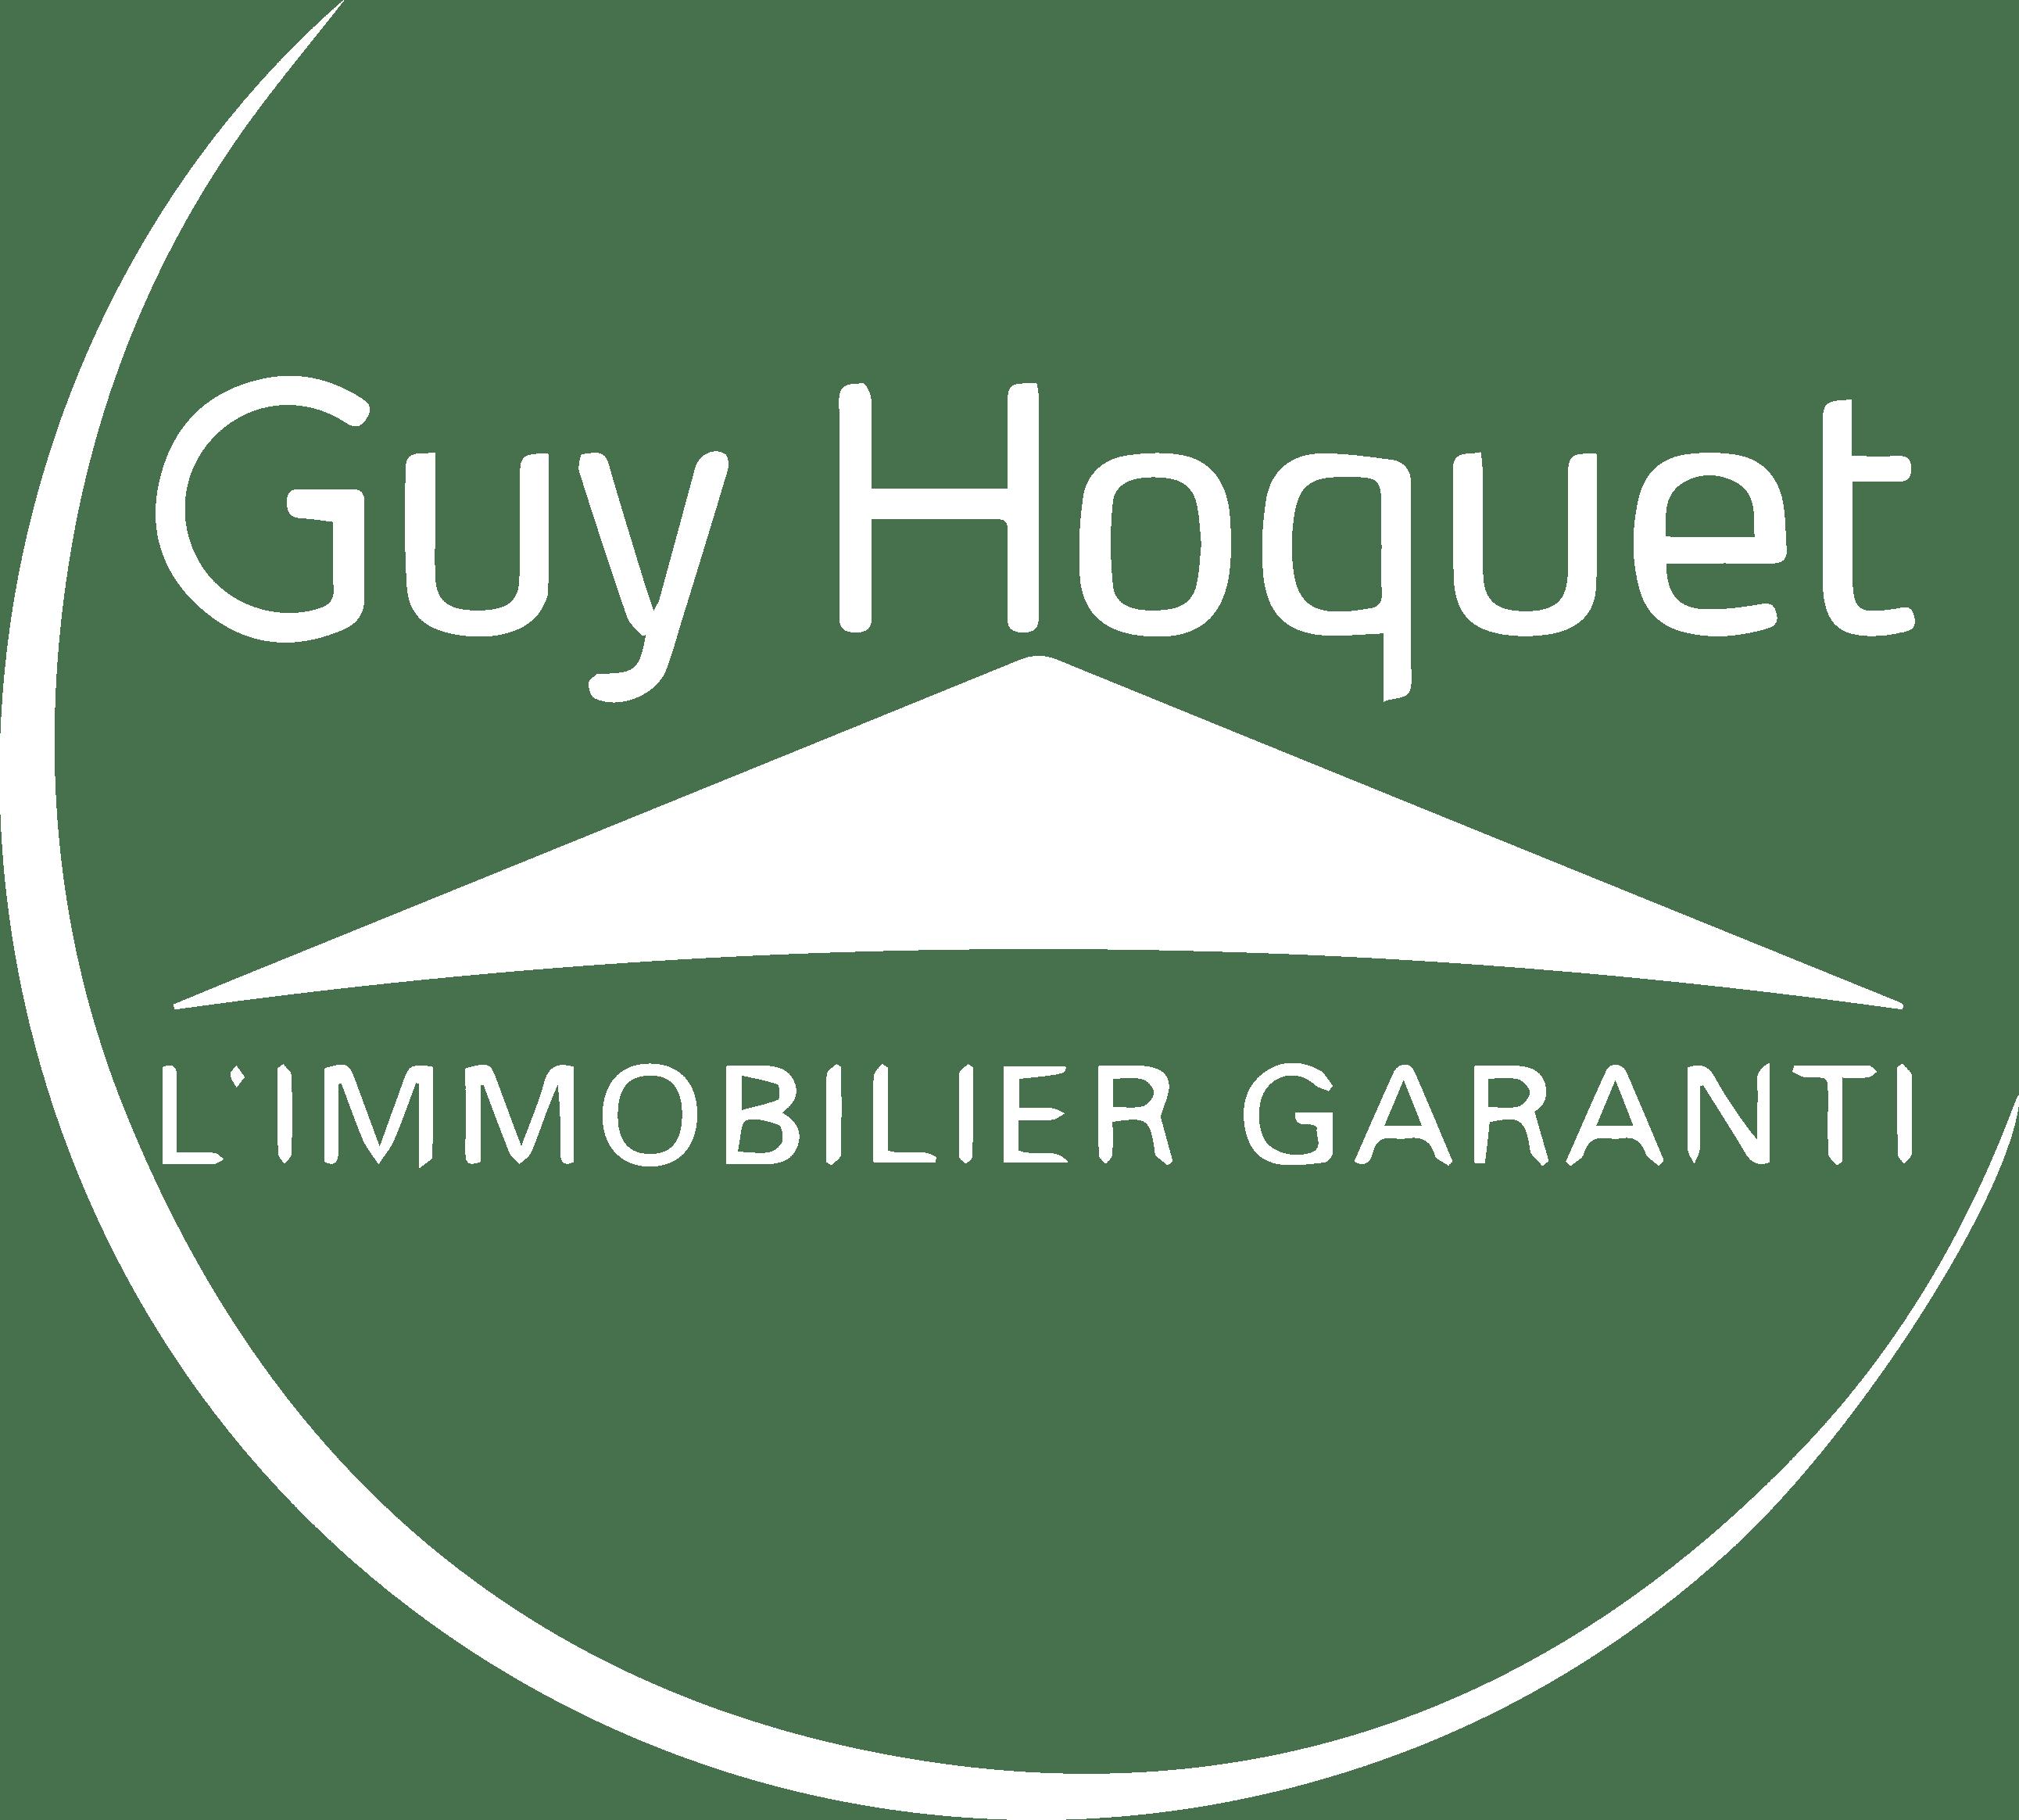 Guy Hoquet - Client - GMAO Agence Immobilière